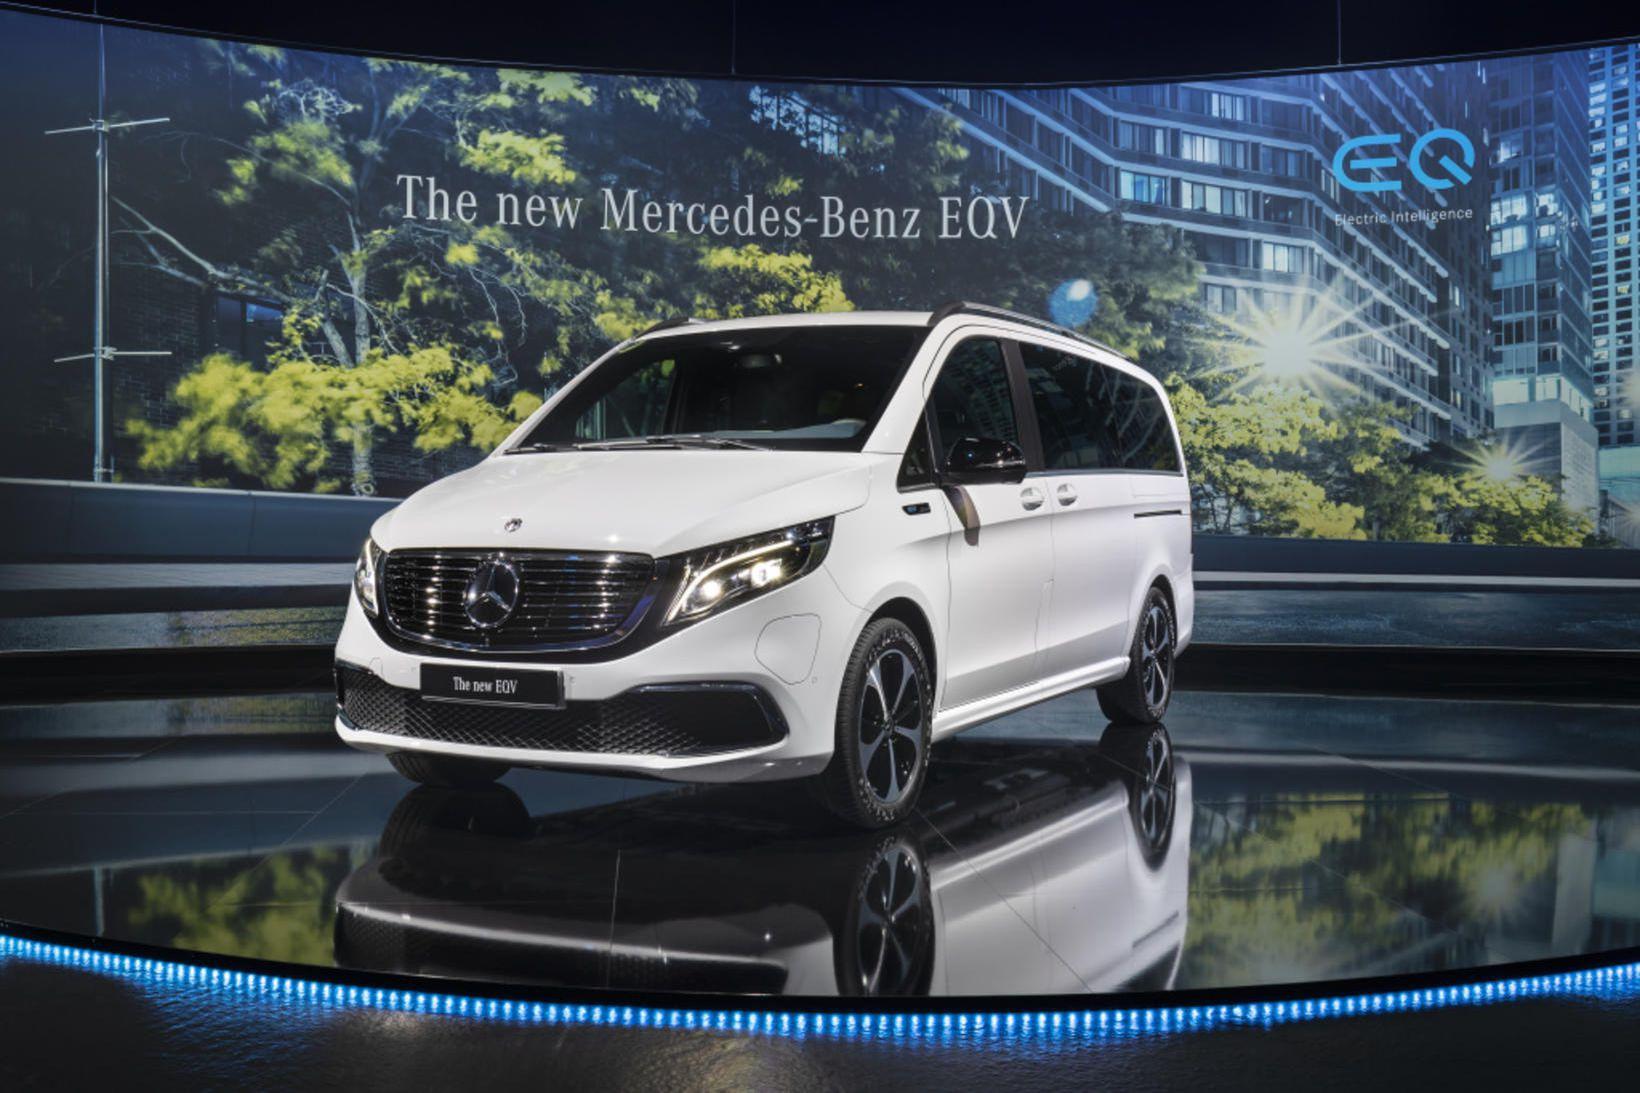 Mercedes-Benz EQV. Rafdrægi hans er 356 km.